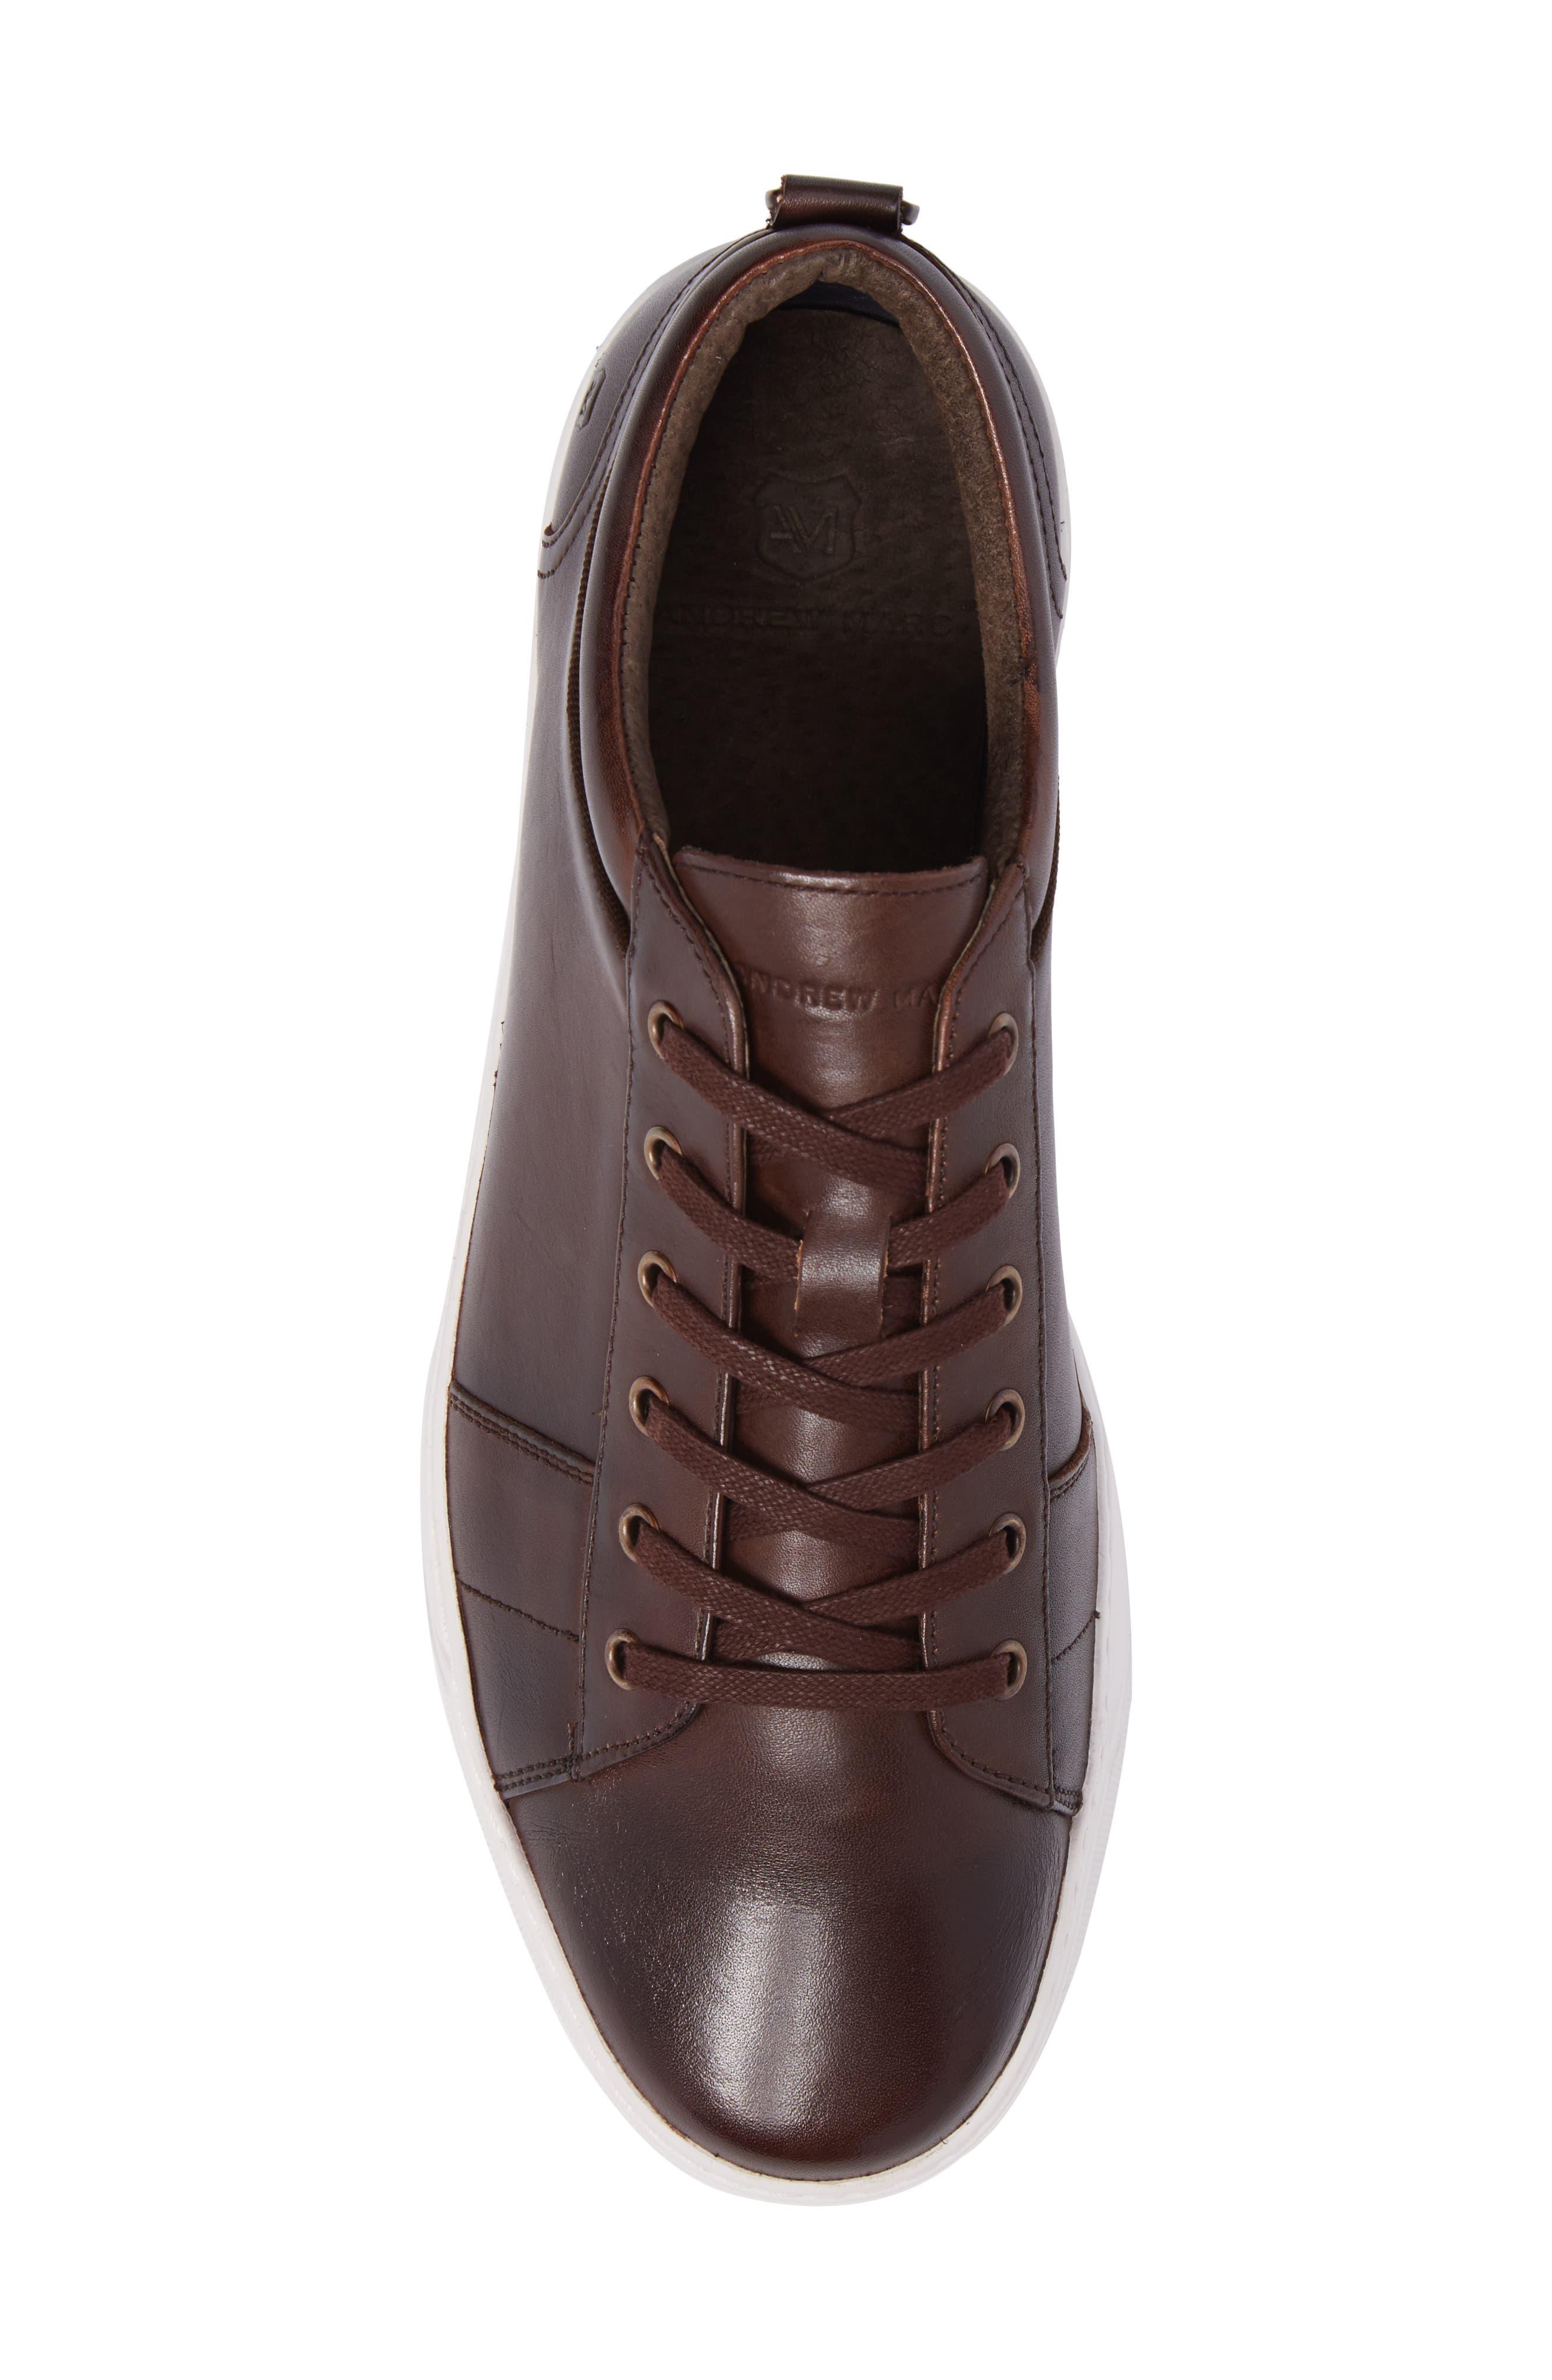 'Darwood' Sneaker,                             Alternate thumbnail 4, color,                             Dark Brown/ White Leather